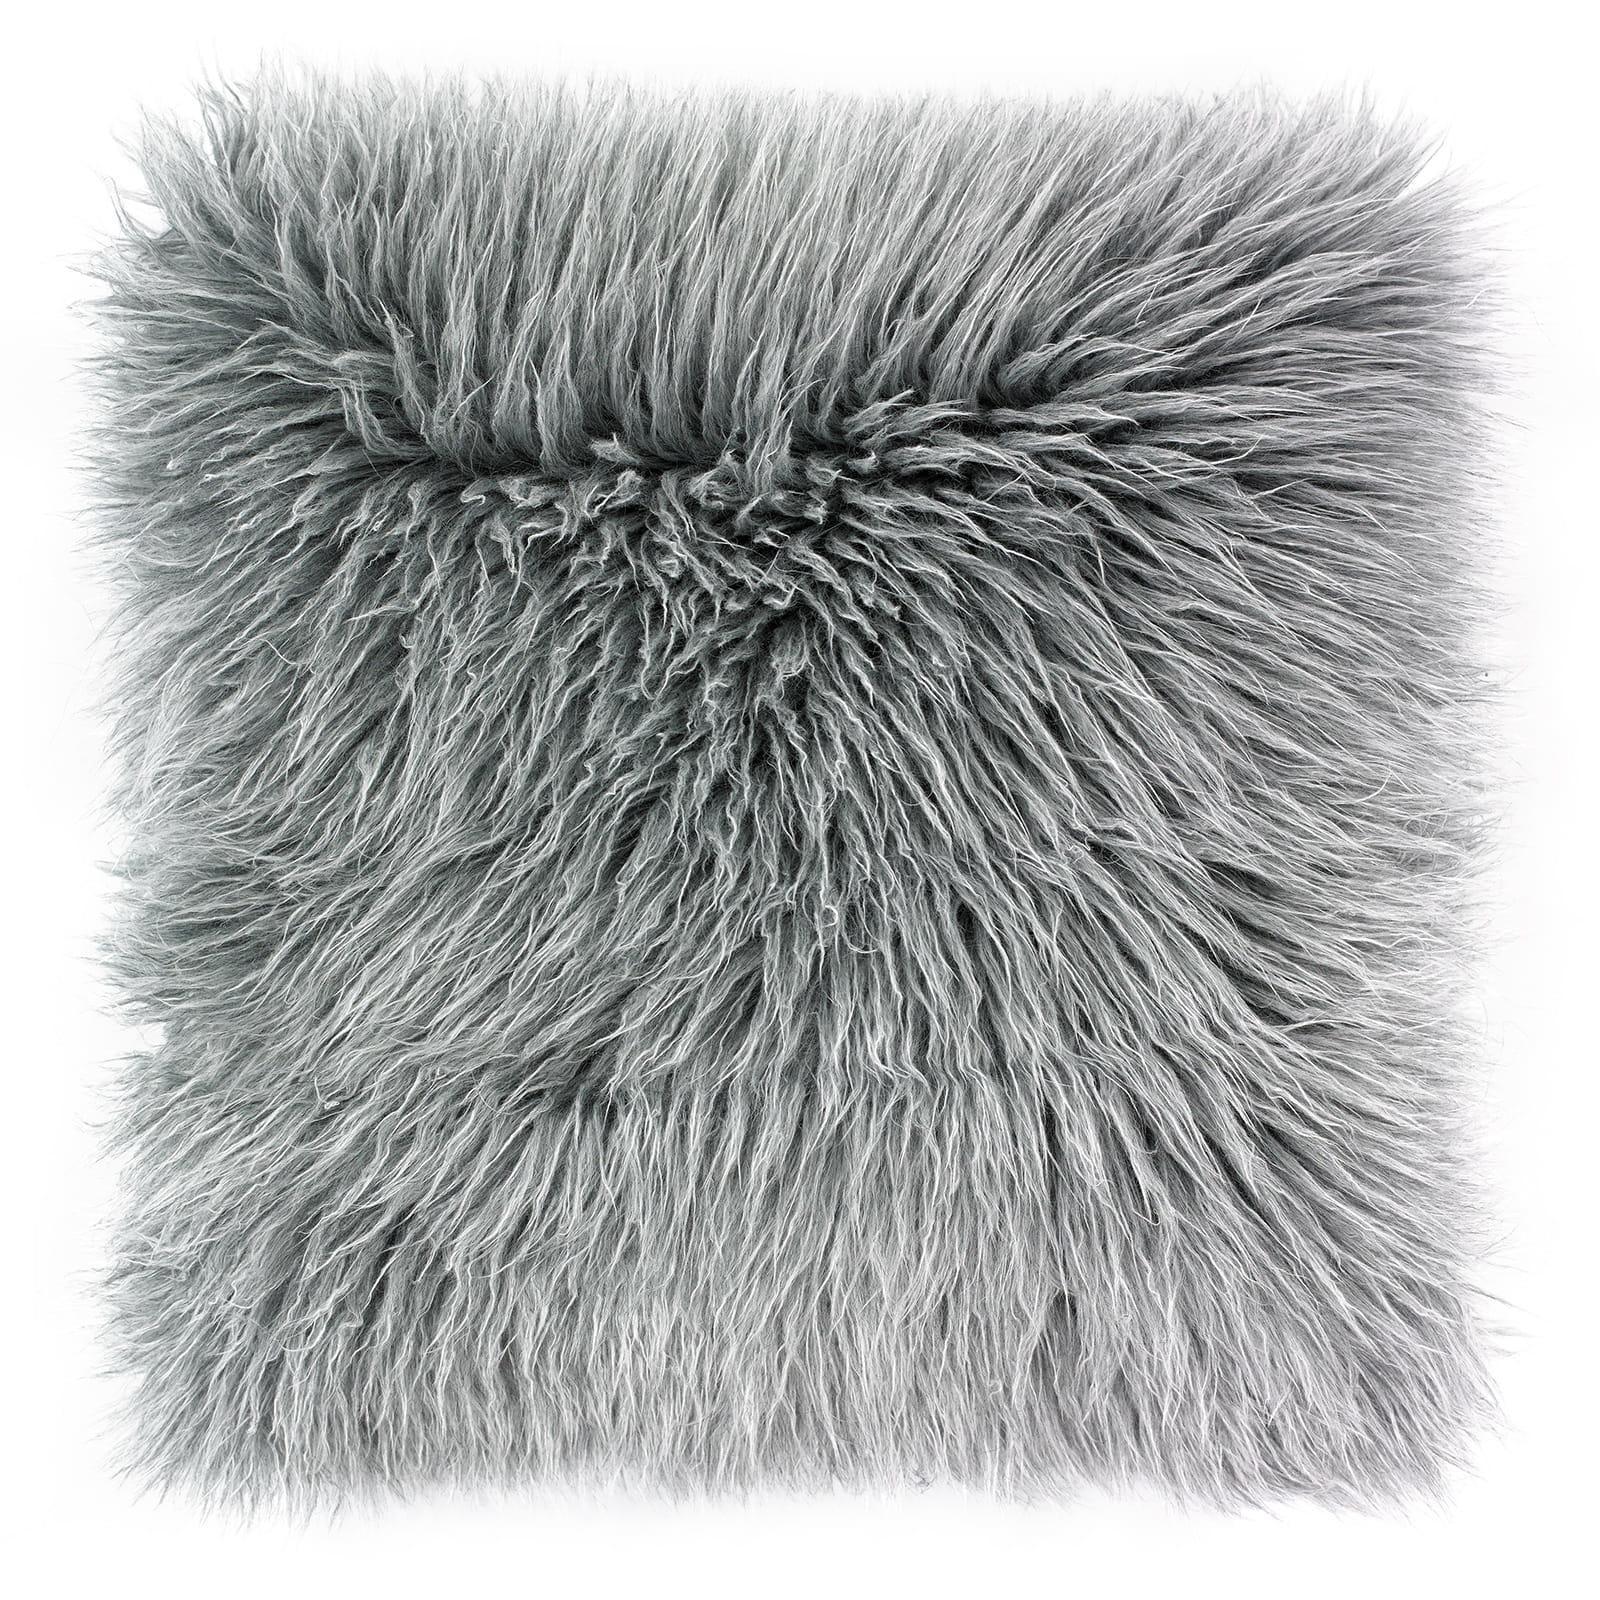 Poduszka dekoracyjna Fluffy Grey 50x50 cm - We Love Candles&We Love Beds